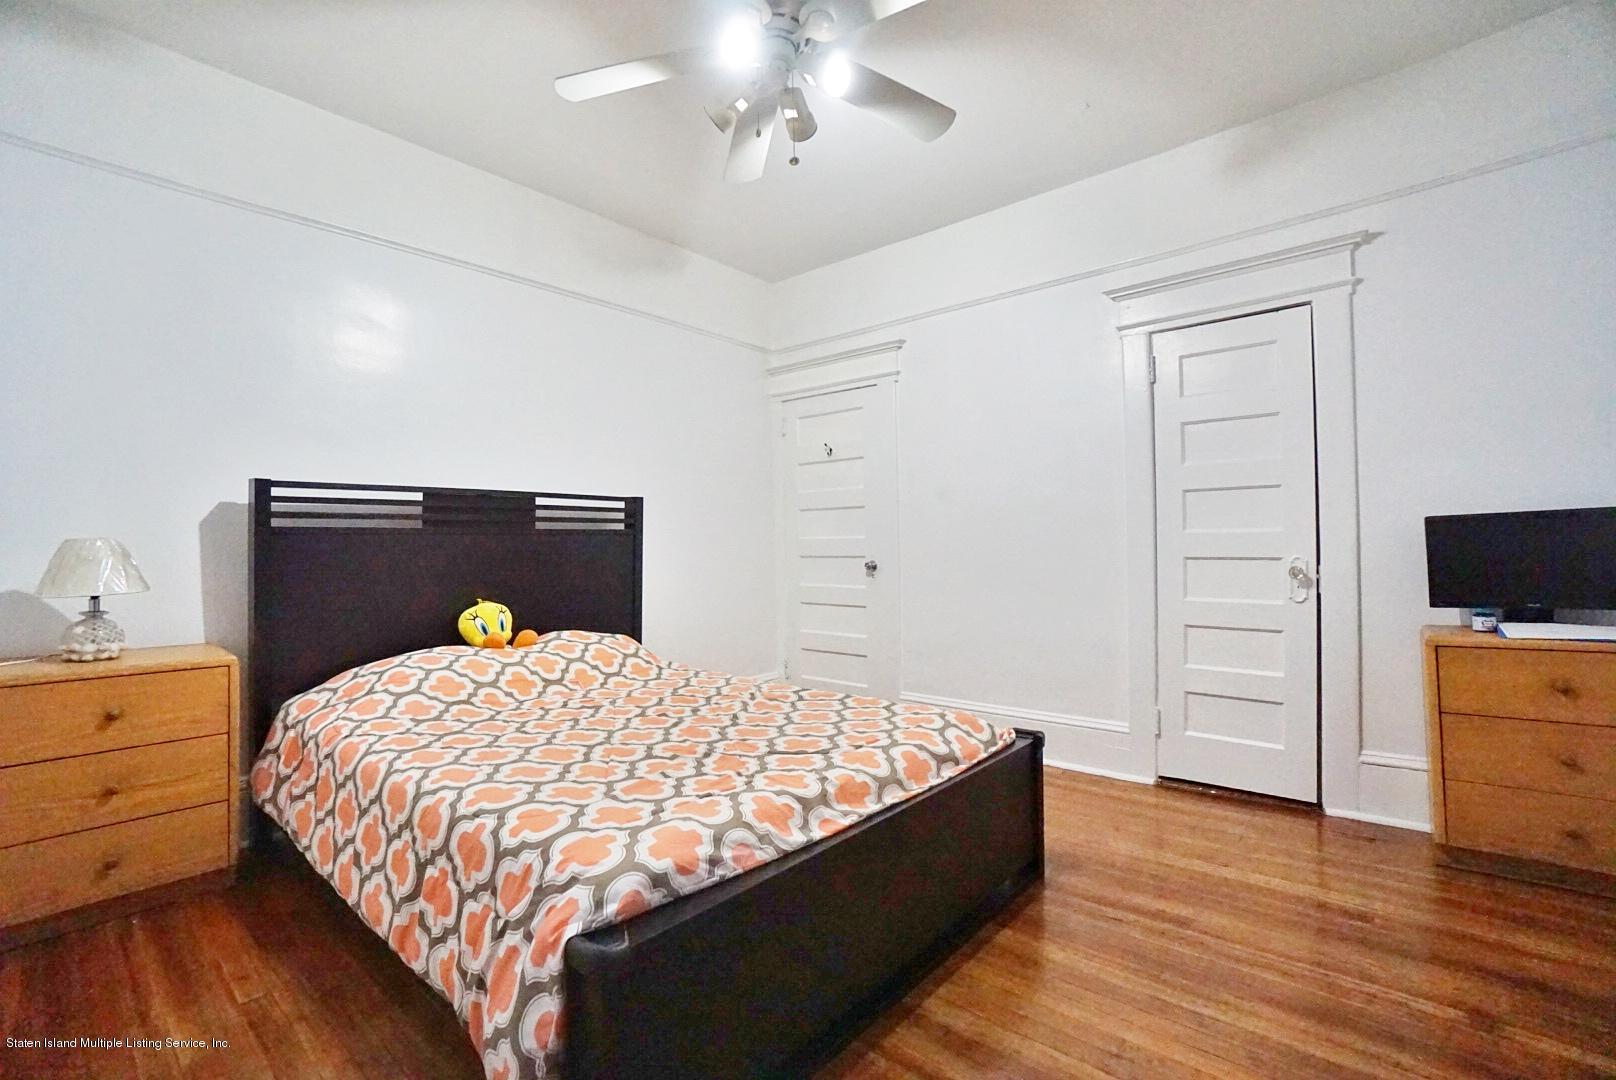 Single Family - Detached 31 Pelton Avenue  Staten Island, NY 10310, MLS-1132177-22